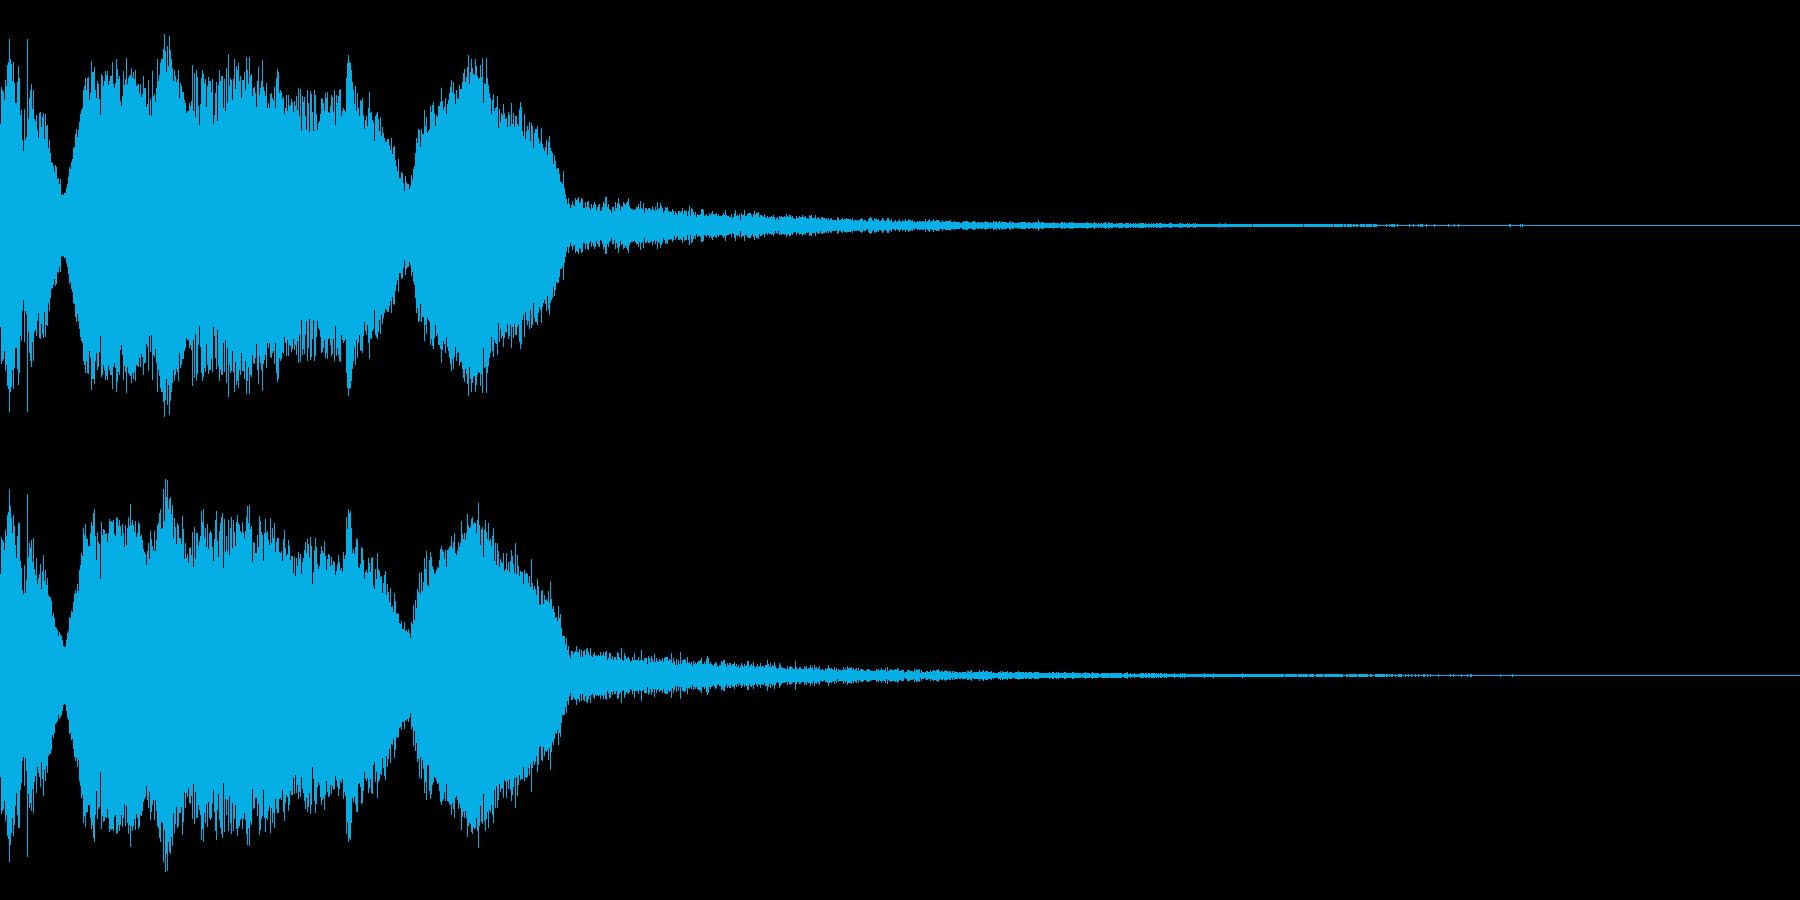 DJFX ヒットチャート発表前SE 16の再生済みの波形